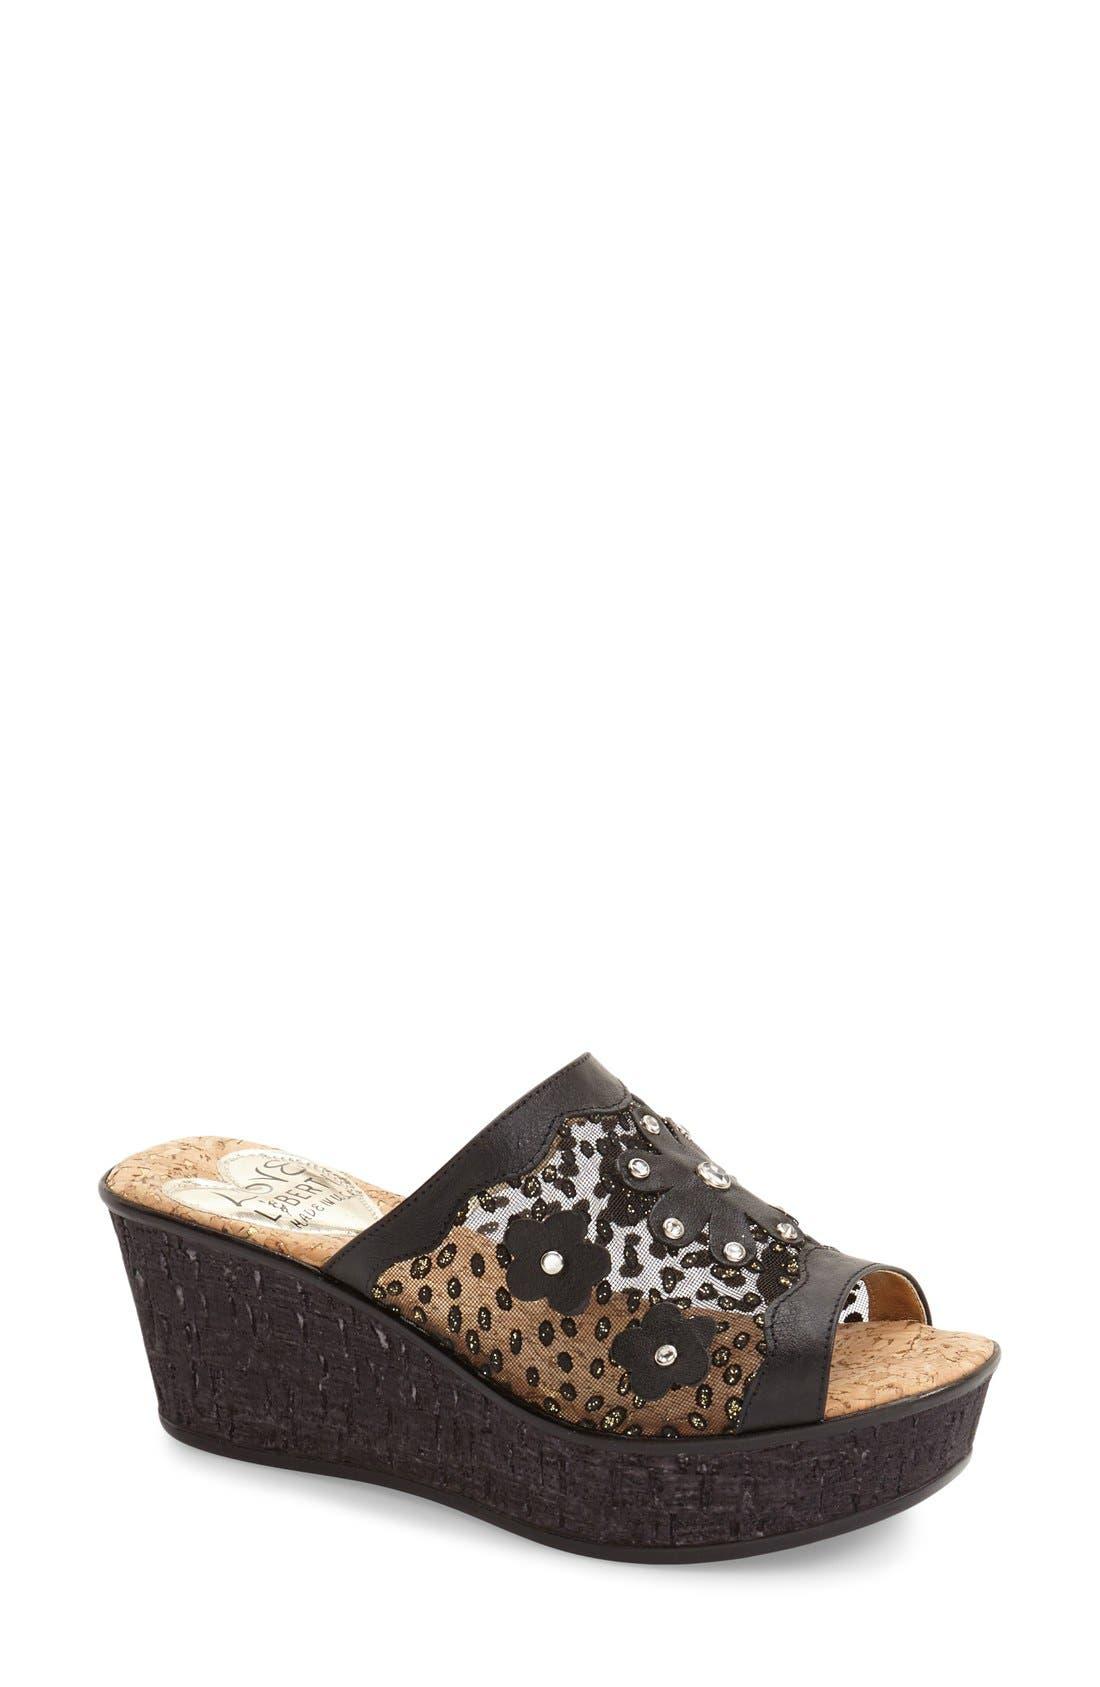 Main Image - Love and Liberty 'Jamila' Platform Wedge Sandal (Women)